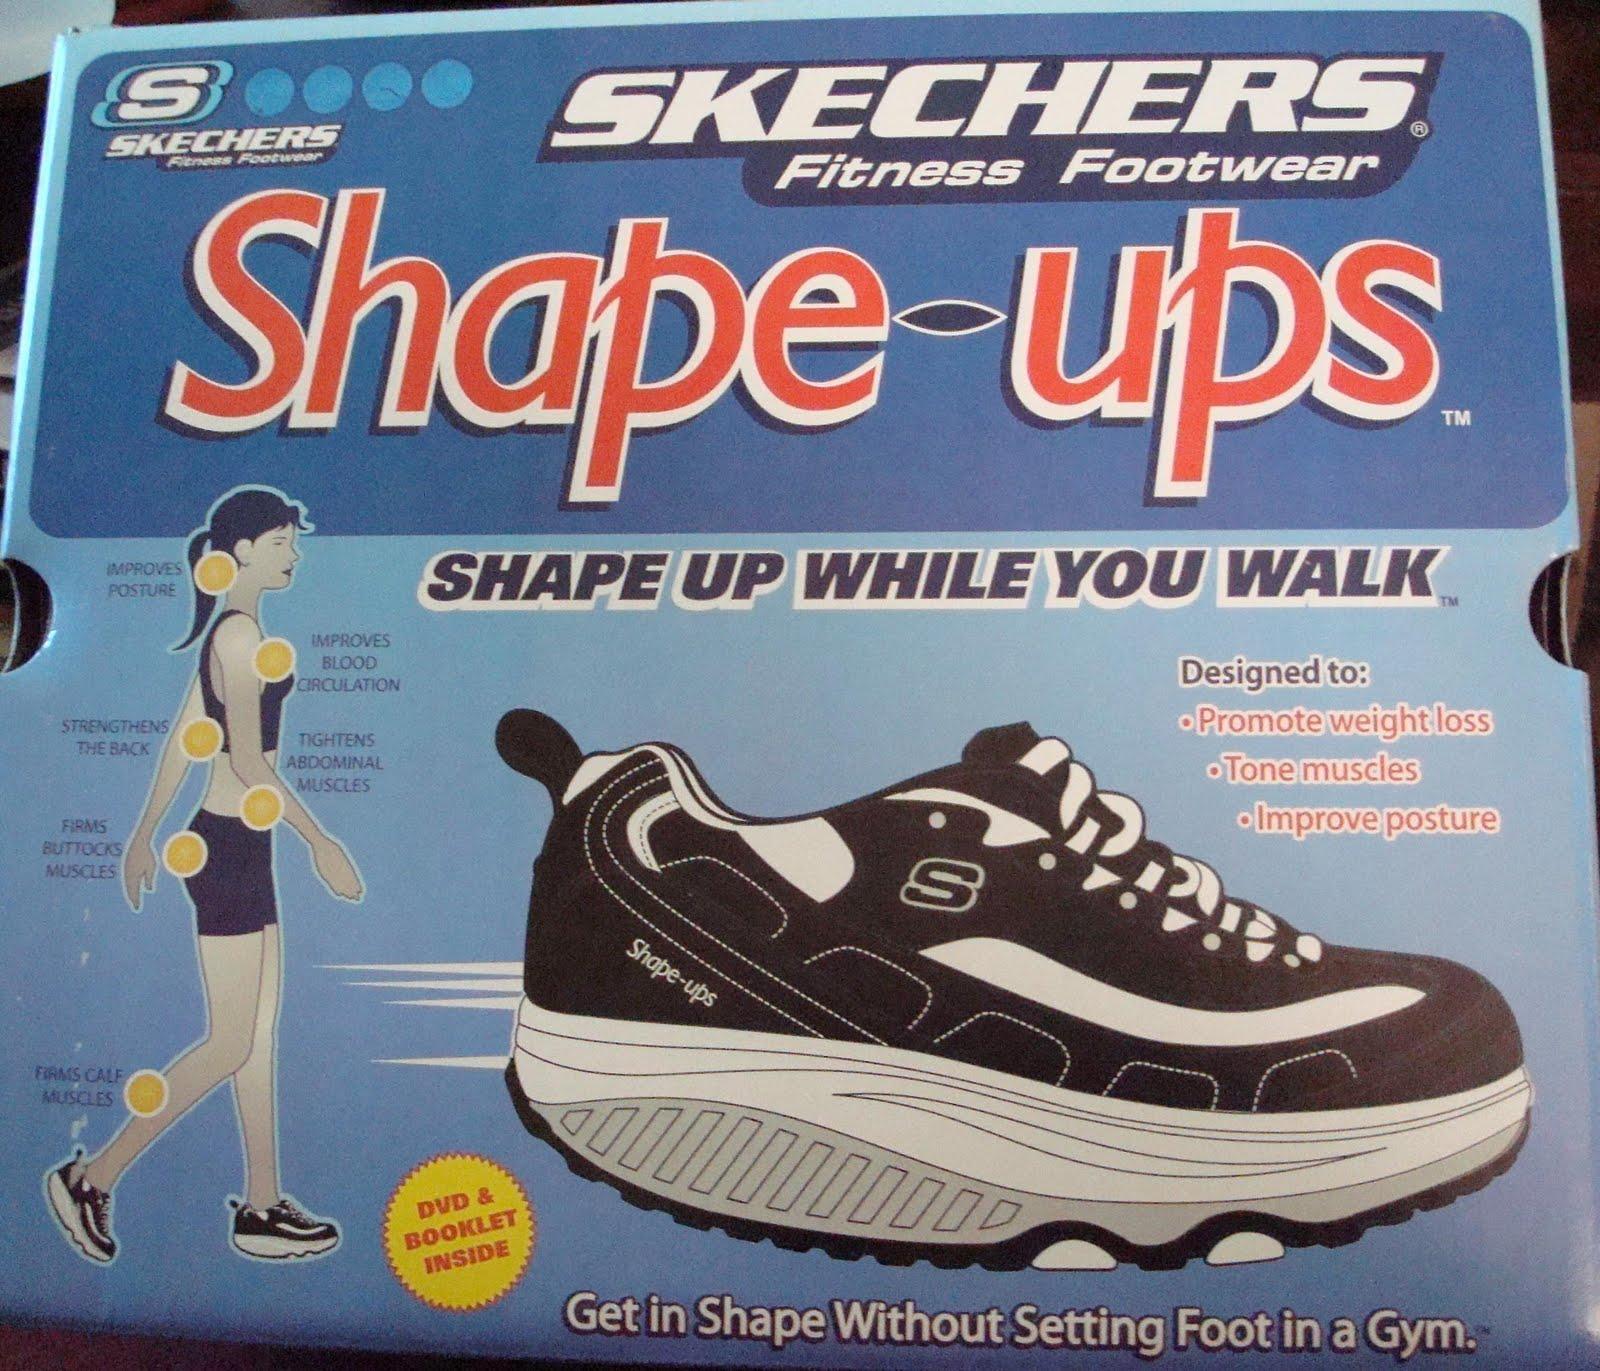 efcb6e4a83a8 XmasDolly  SHAPE-UPS ARE MINE - SKECHERS!!! WOO HOO!